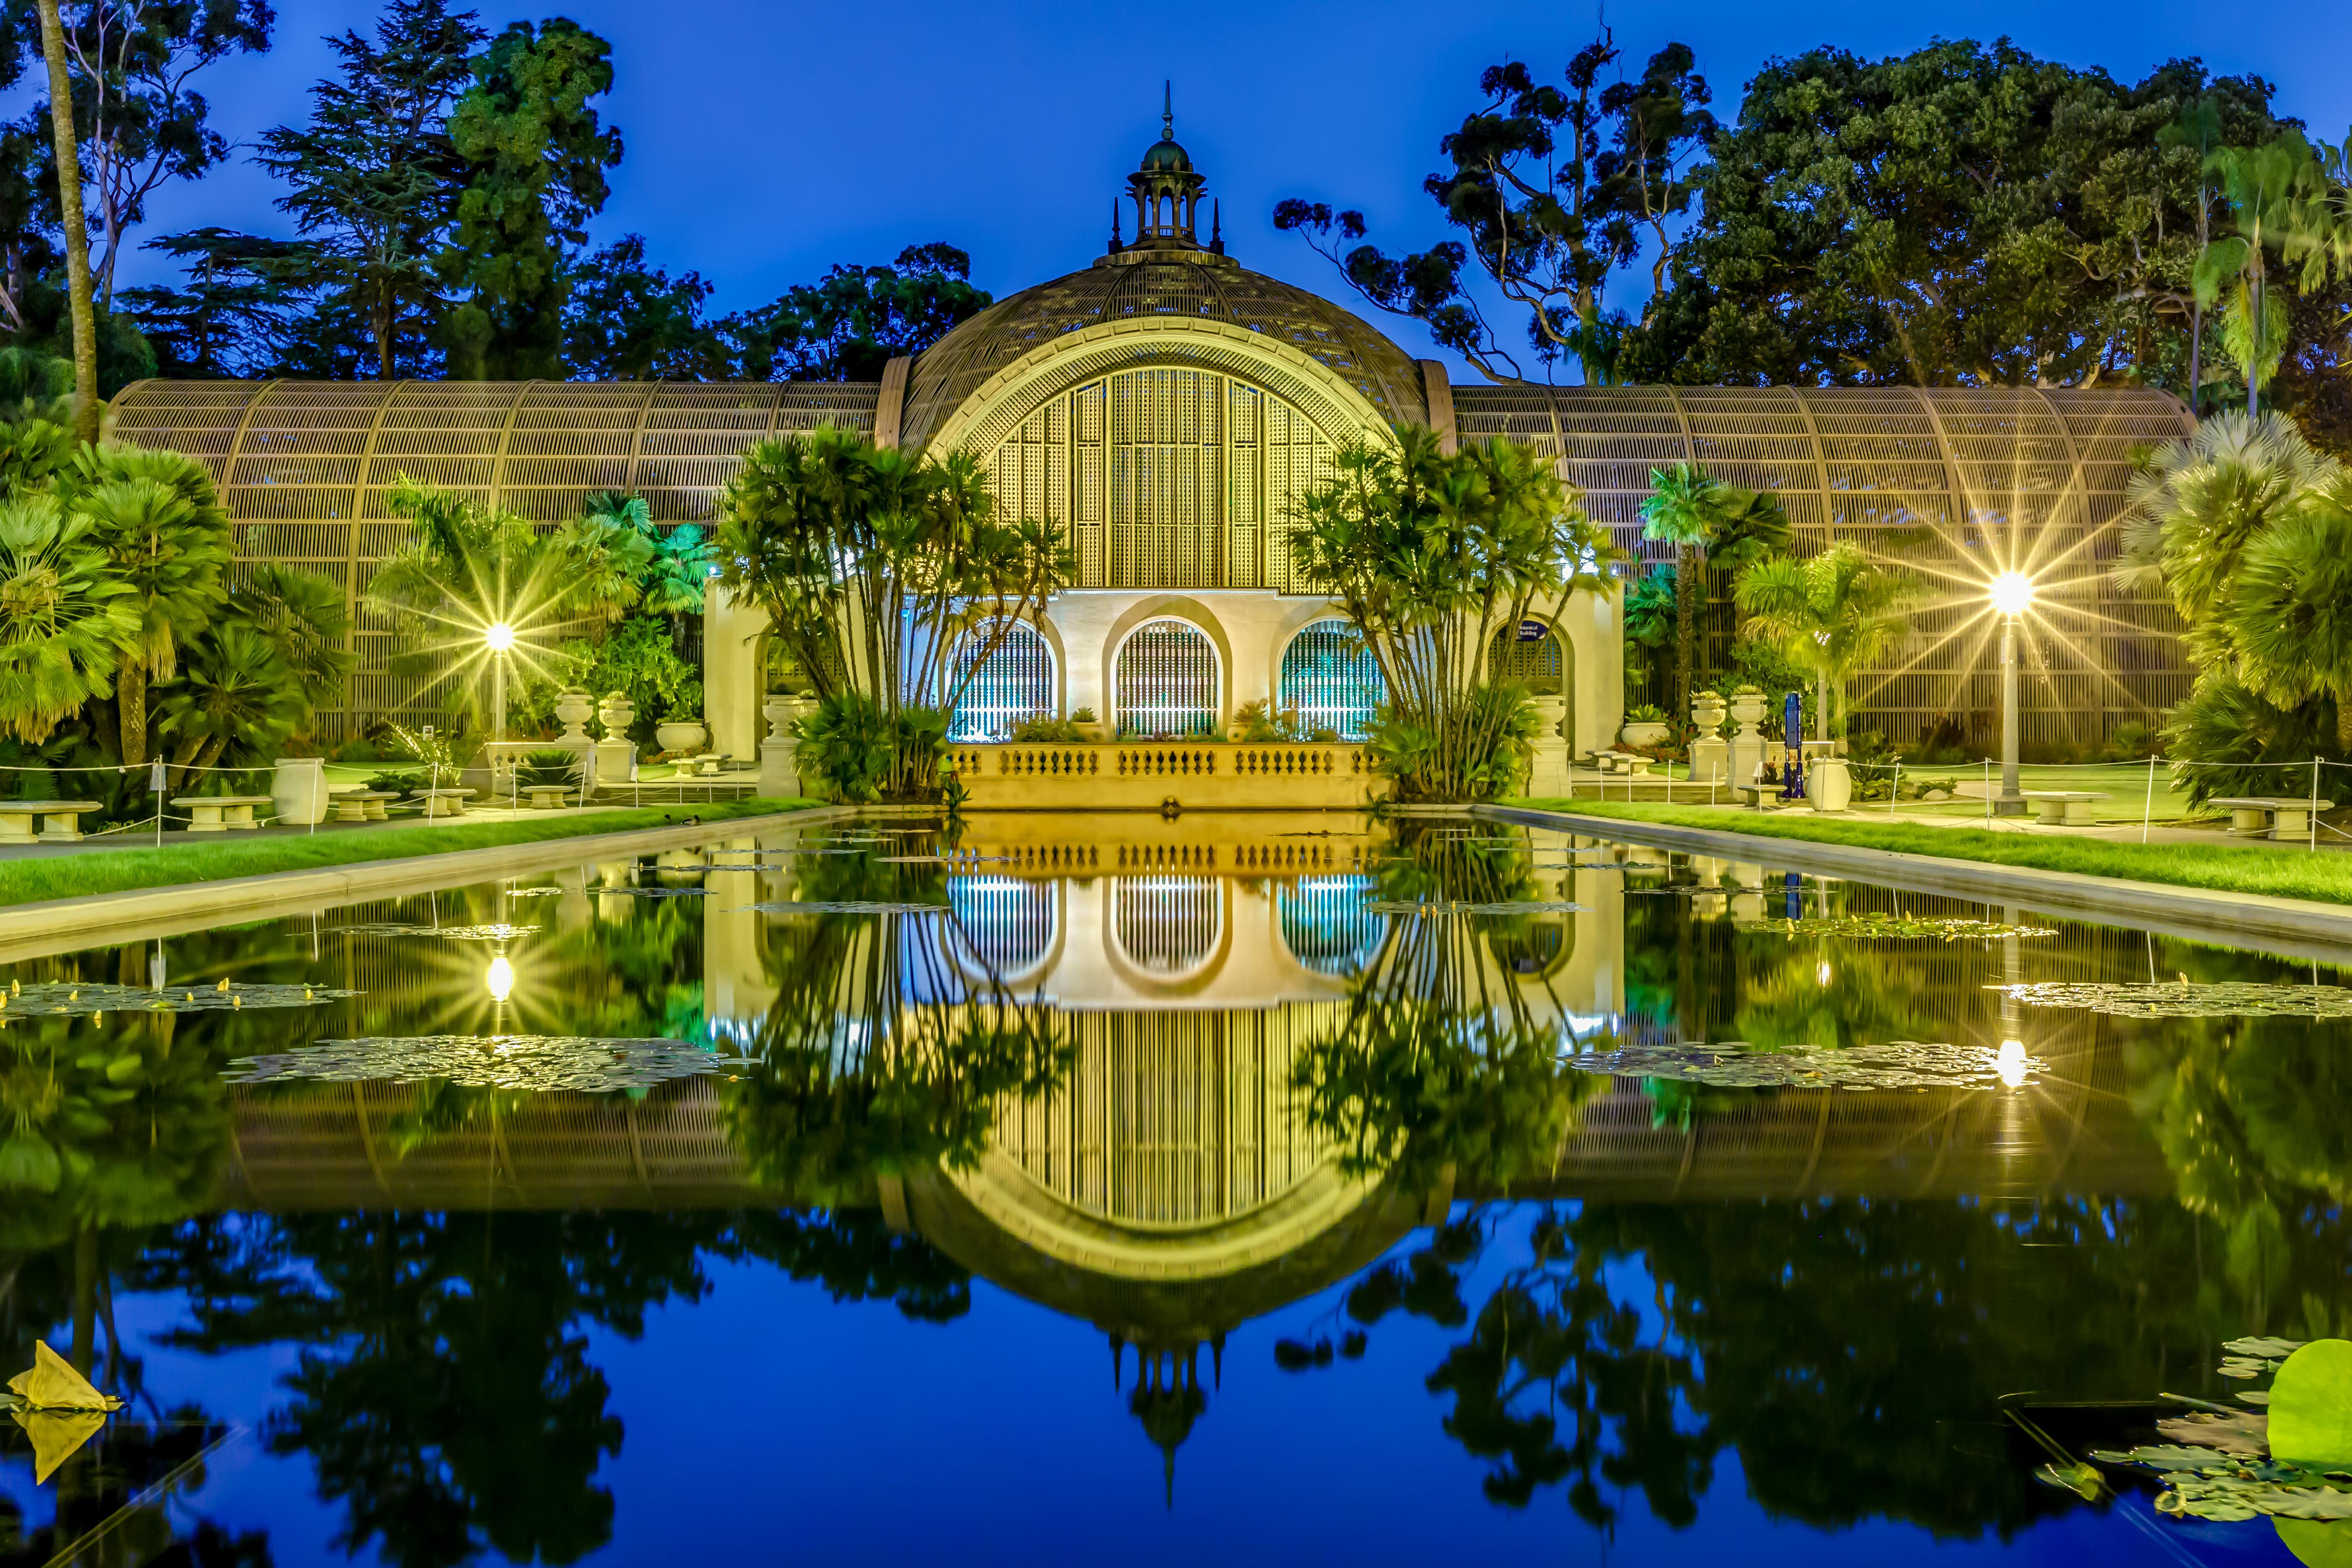 File:The Botanical Garden In Balboa Park, San Diego, California